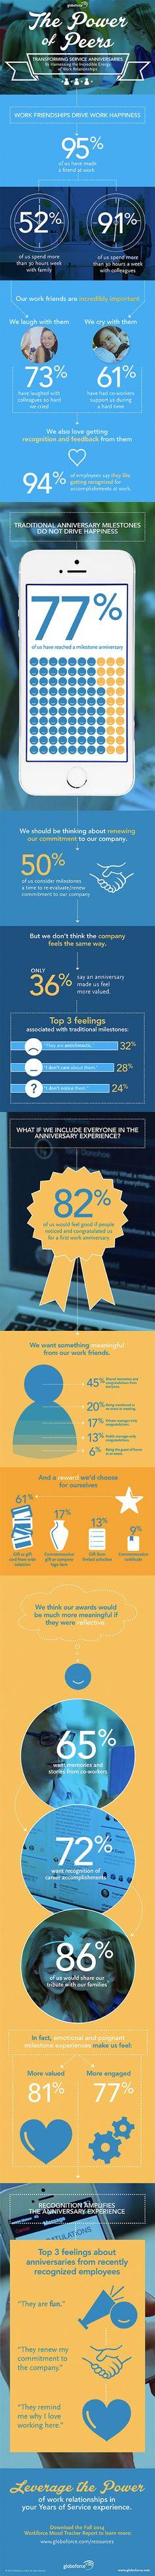 The Hidden Benefits of Happy Co-Workers (Infographic)